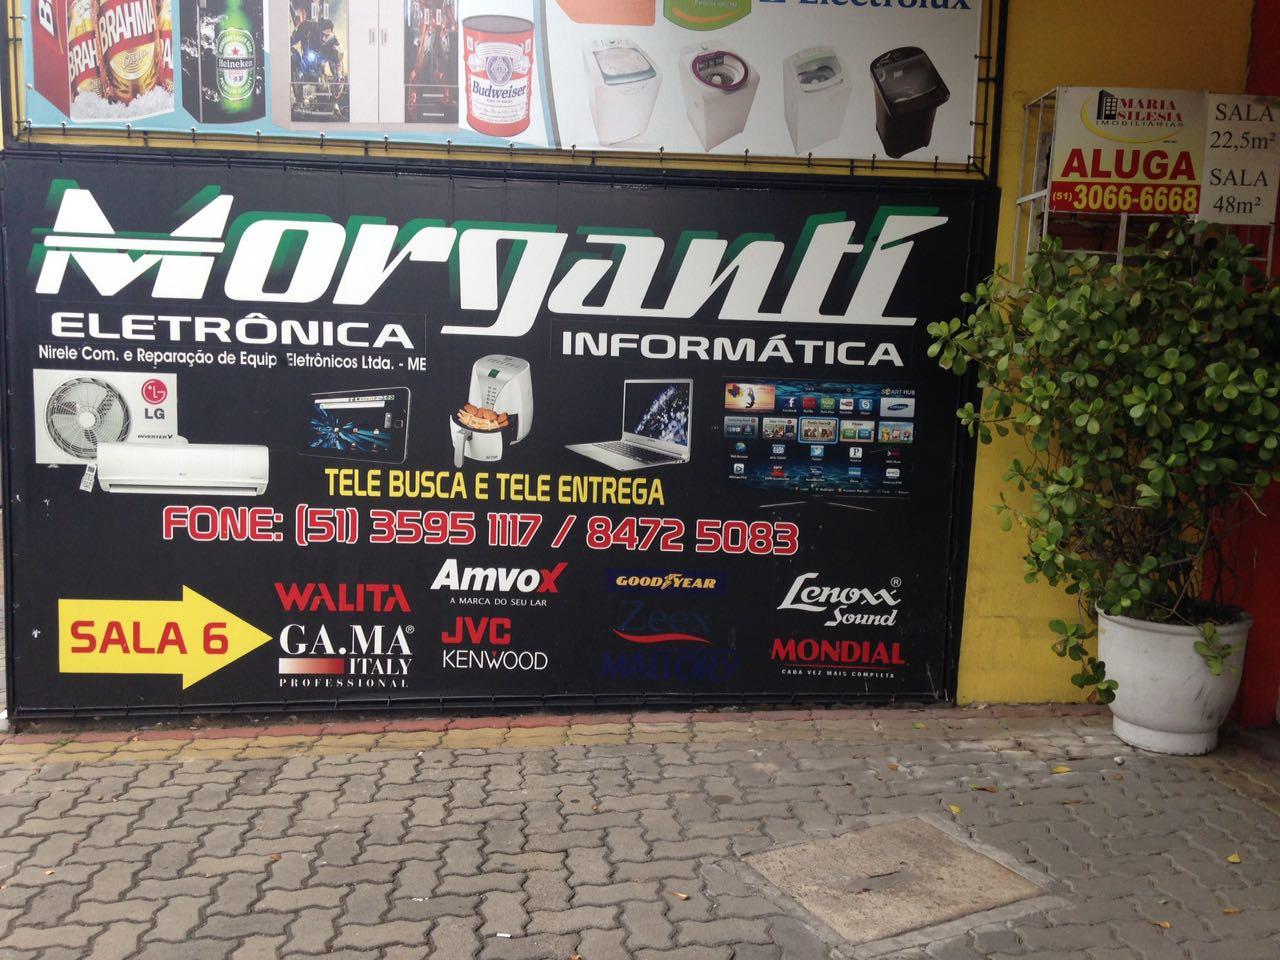 Morganti Eletronica e Informatica logo